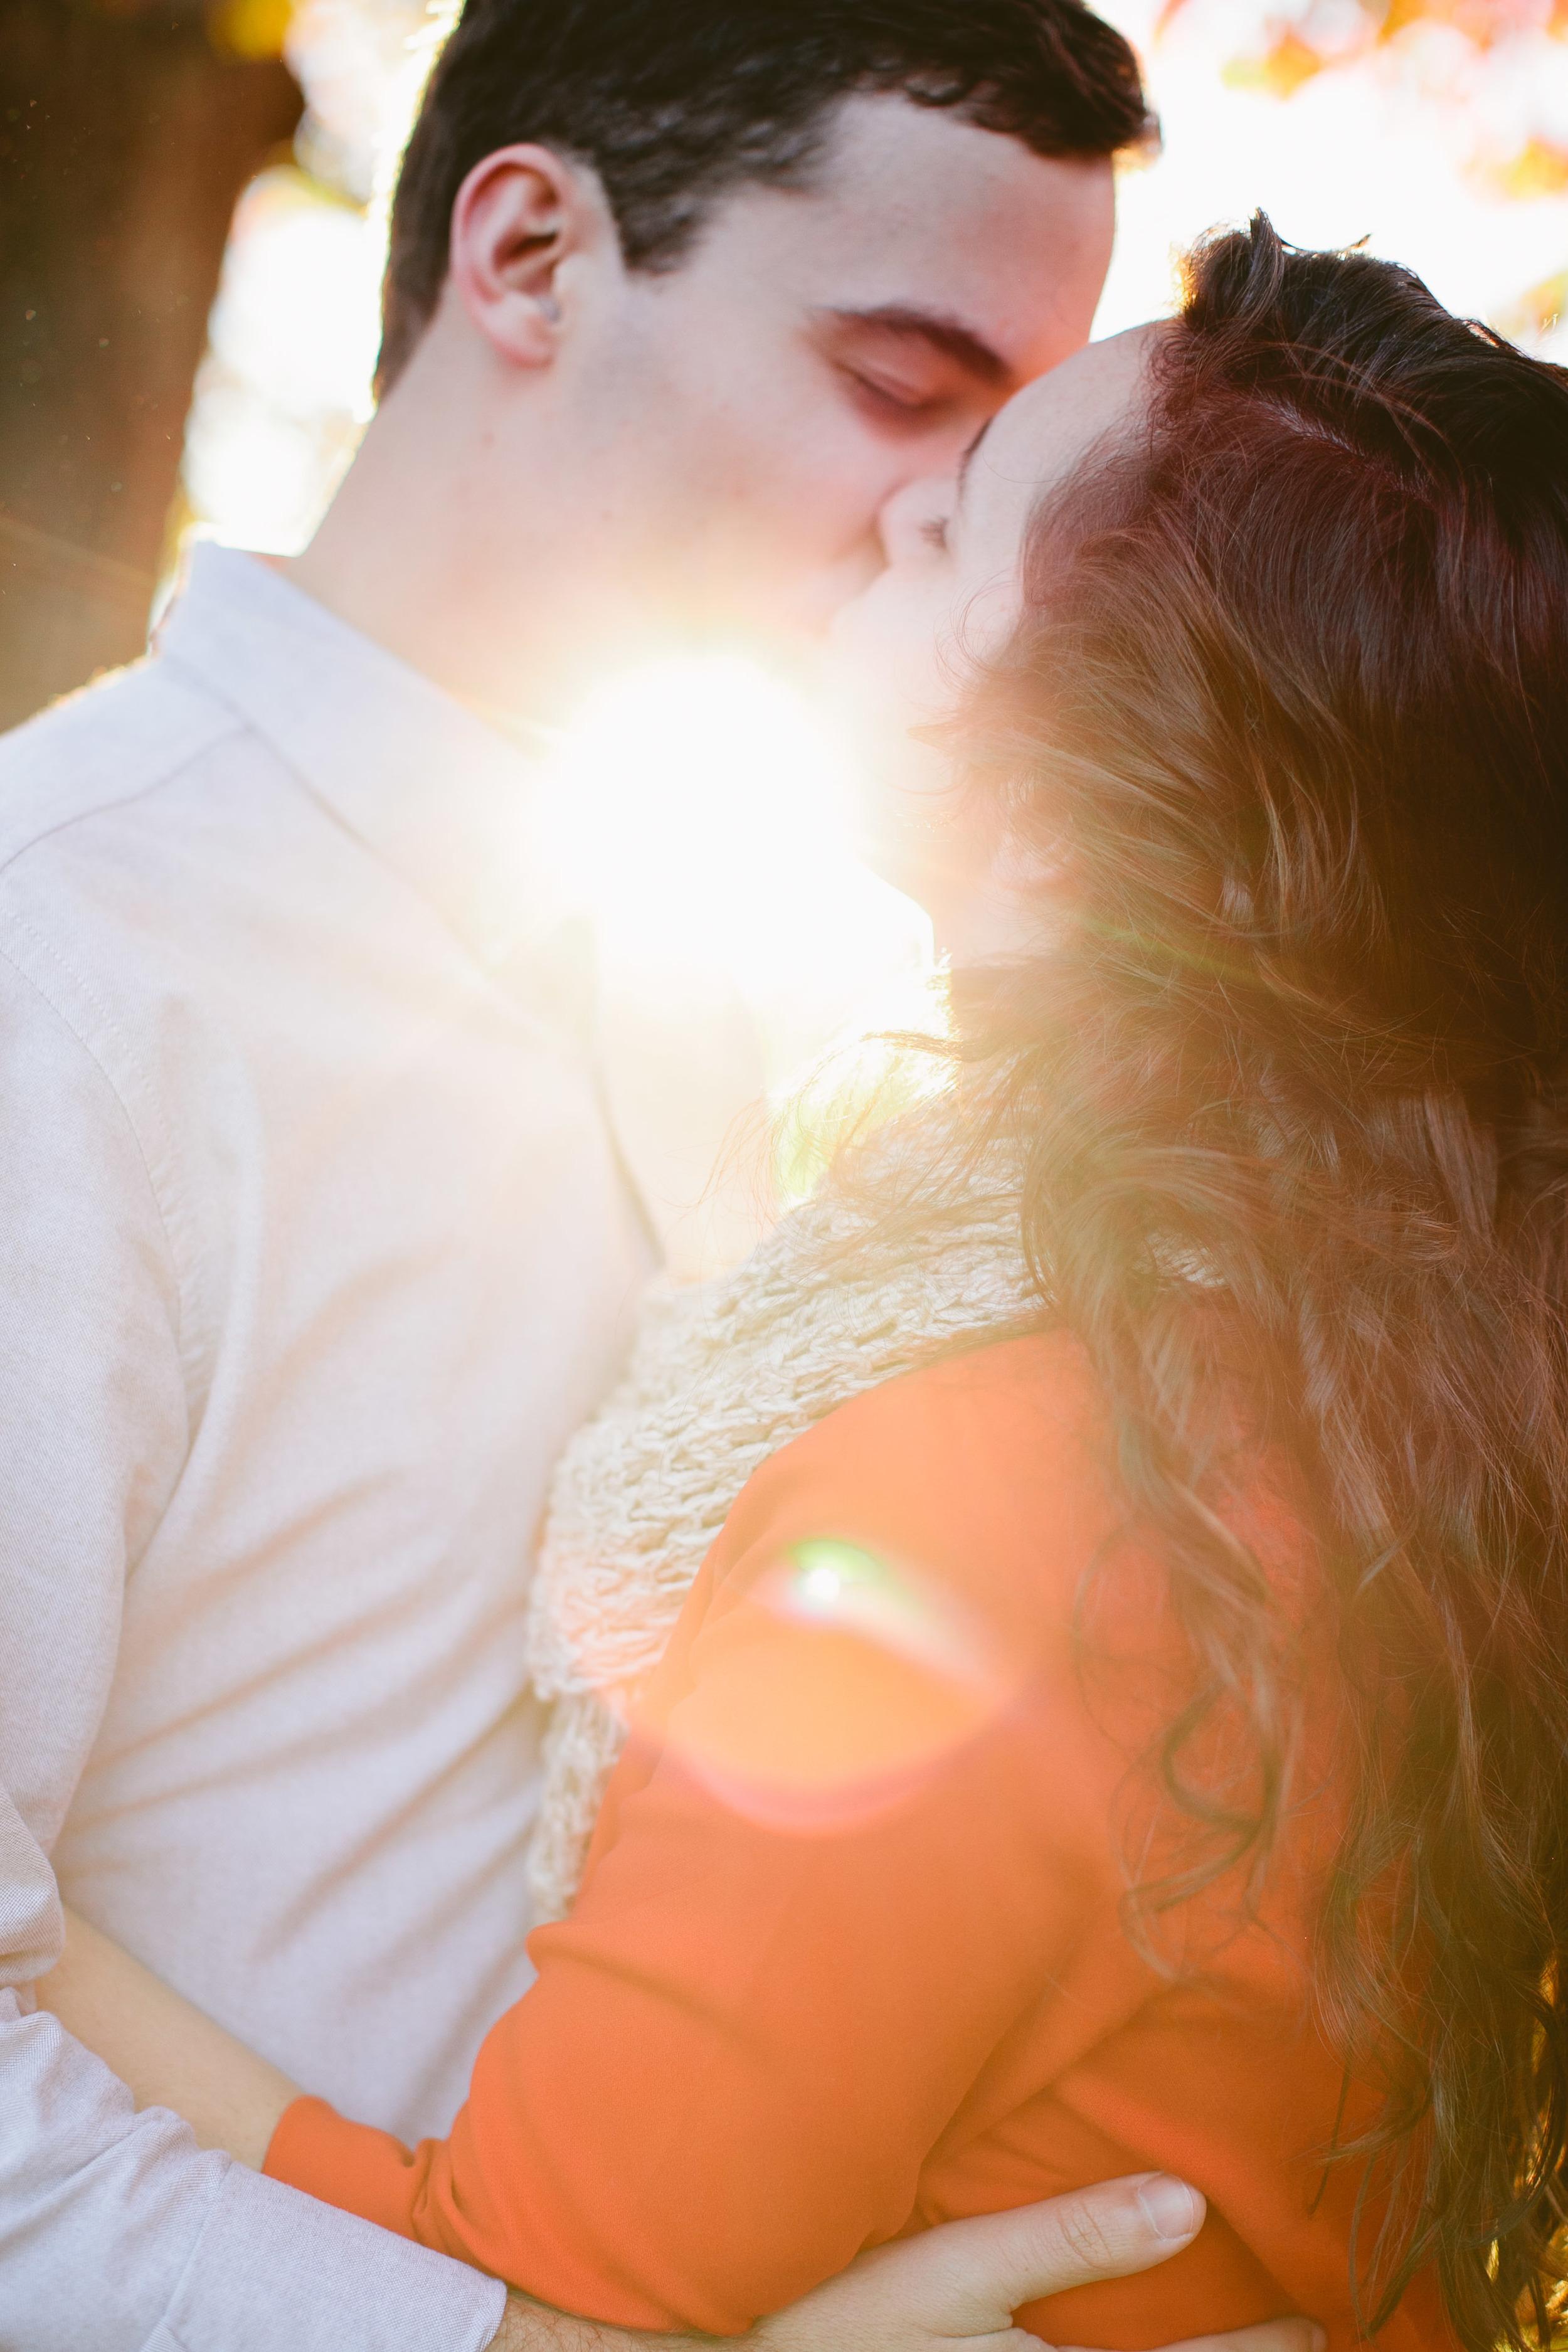 Atlanta-Engagement-Photographer-Kathryn-McCrary-Photography-Piedmont-Park-Virginia-Highlands-Fall-Engagement-Shoot-19.jpg